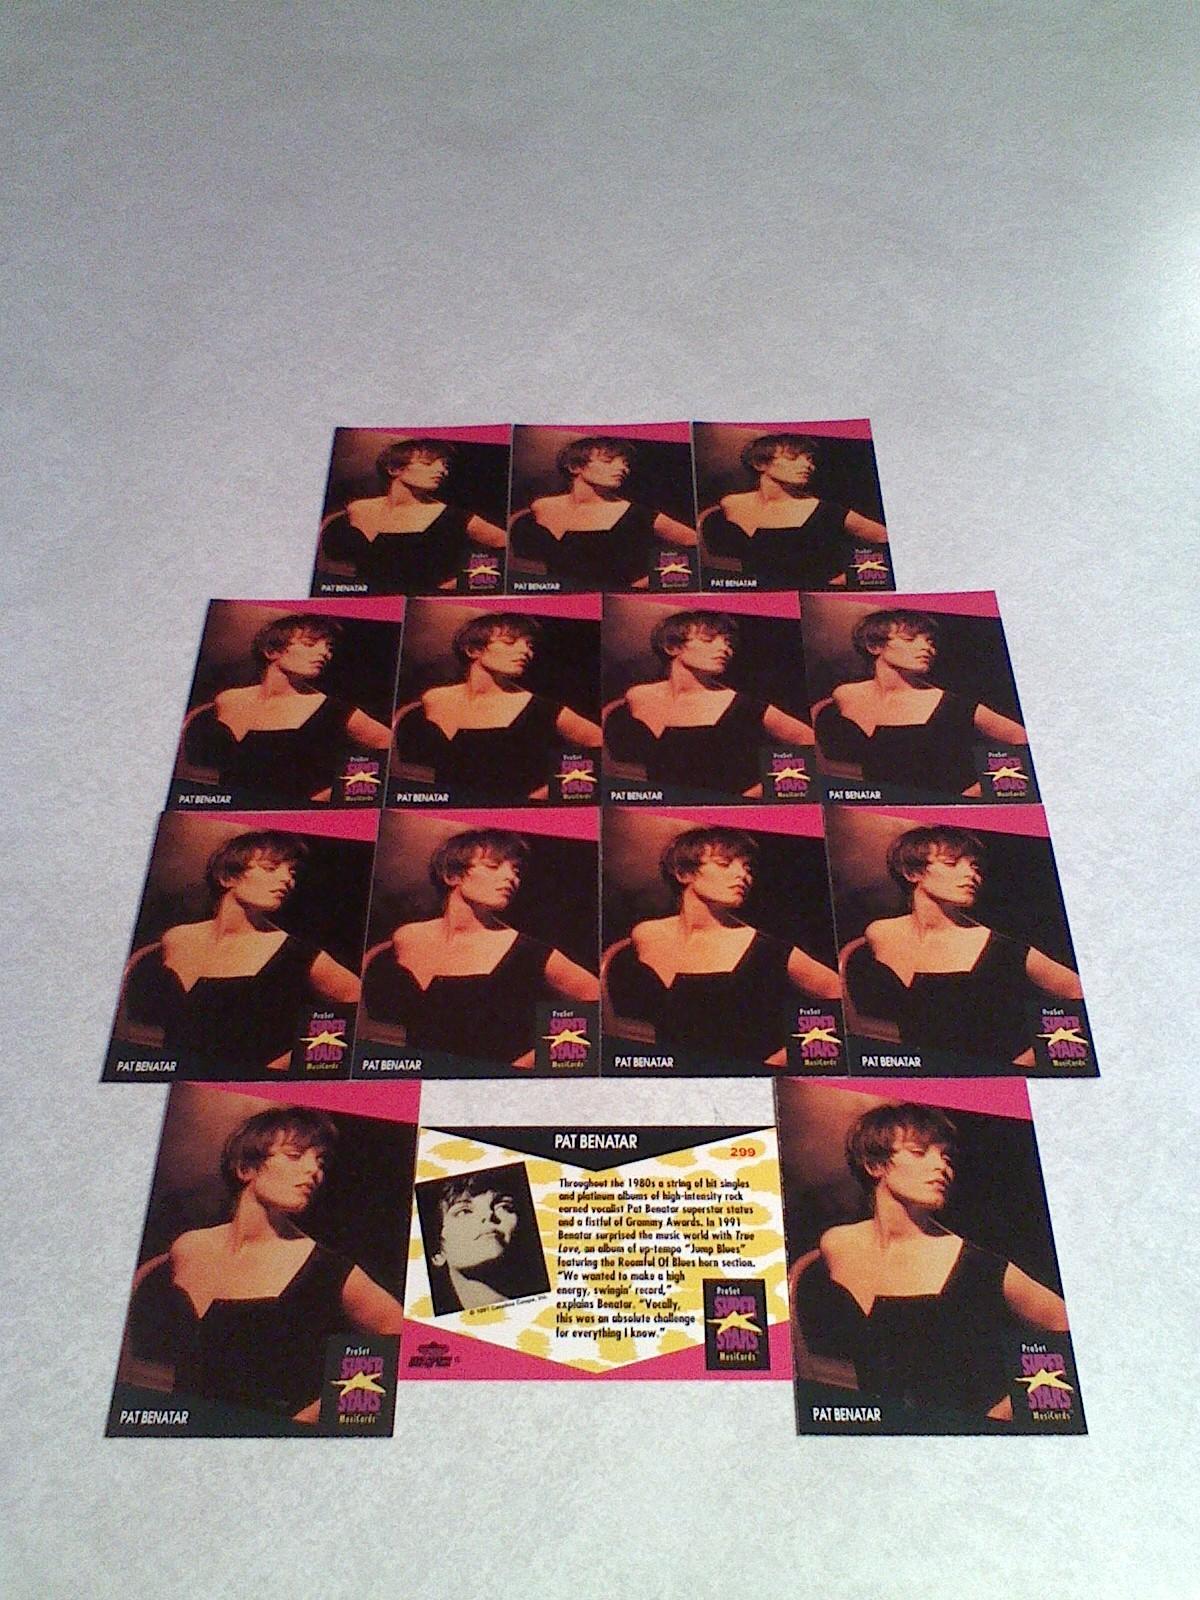 ***PAT BENATAR***  Lot of 14 cards / MUSIC